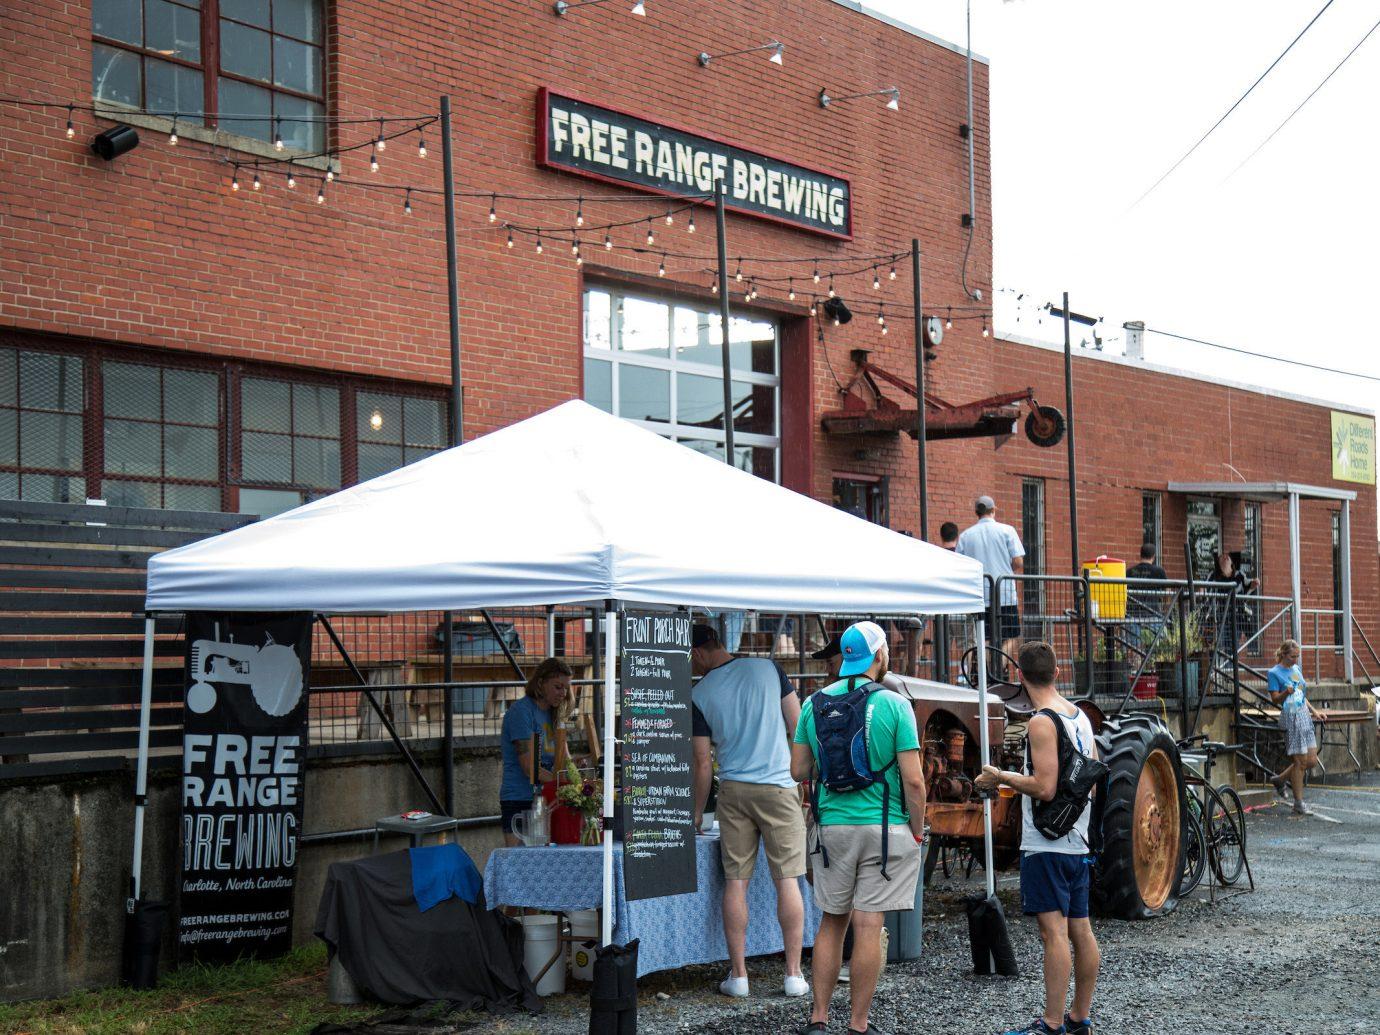 Trip Ideas building outdoor sky public space City street people stall market facade